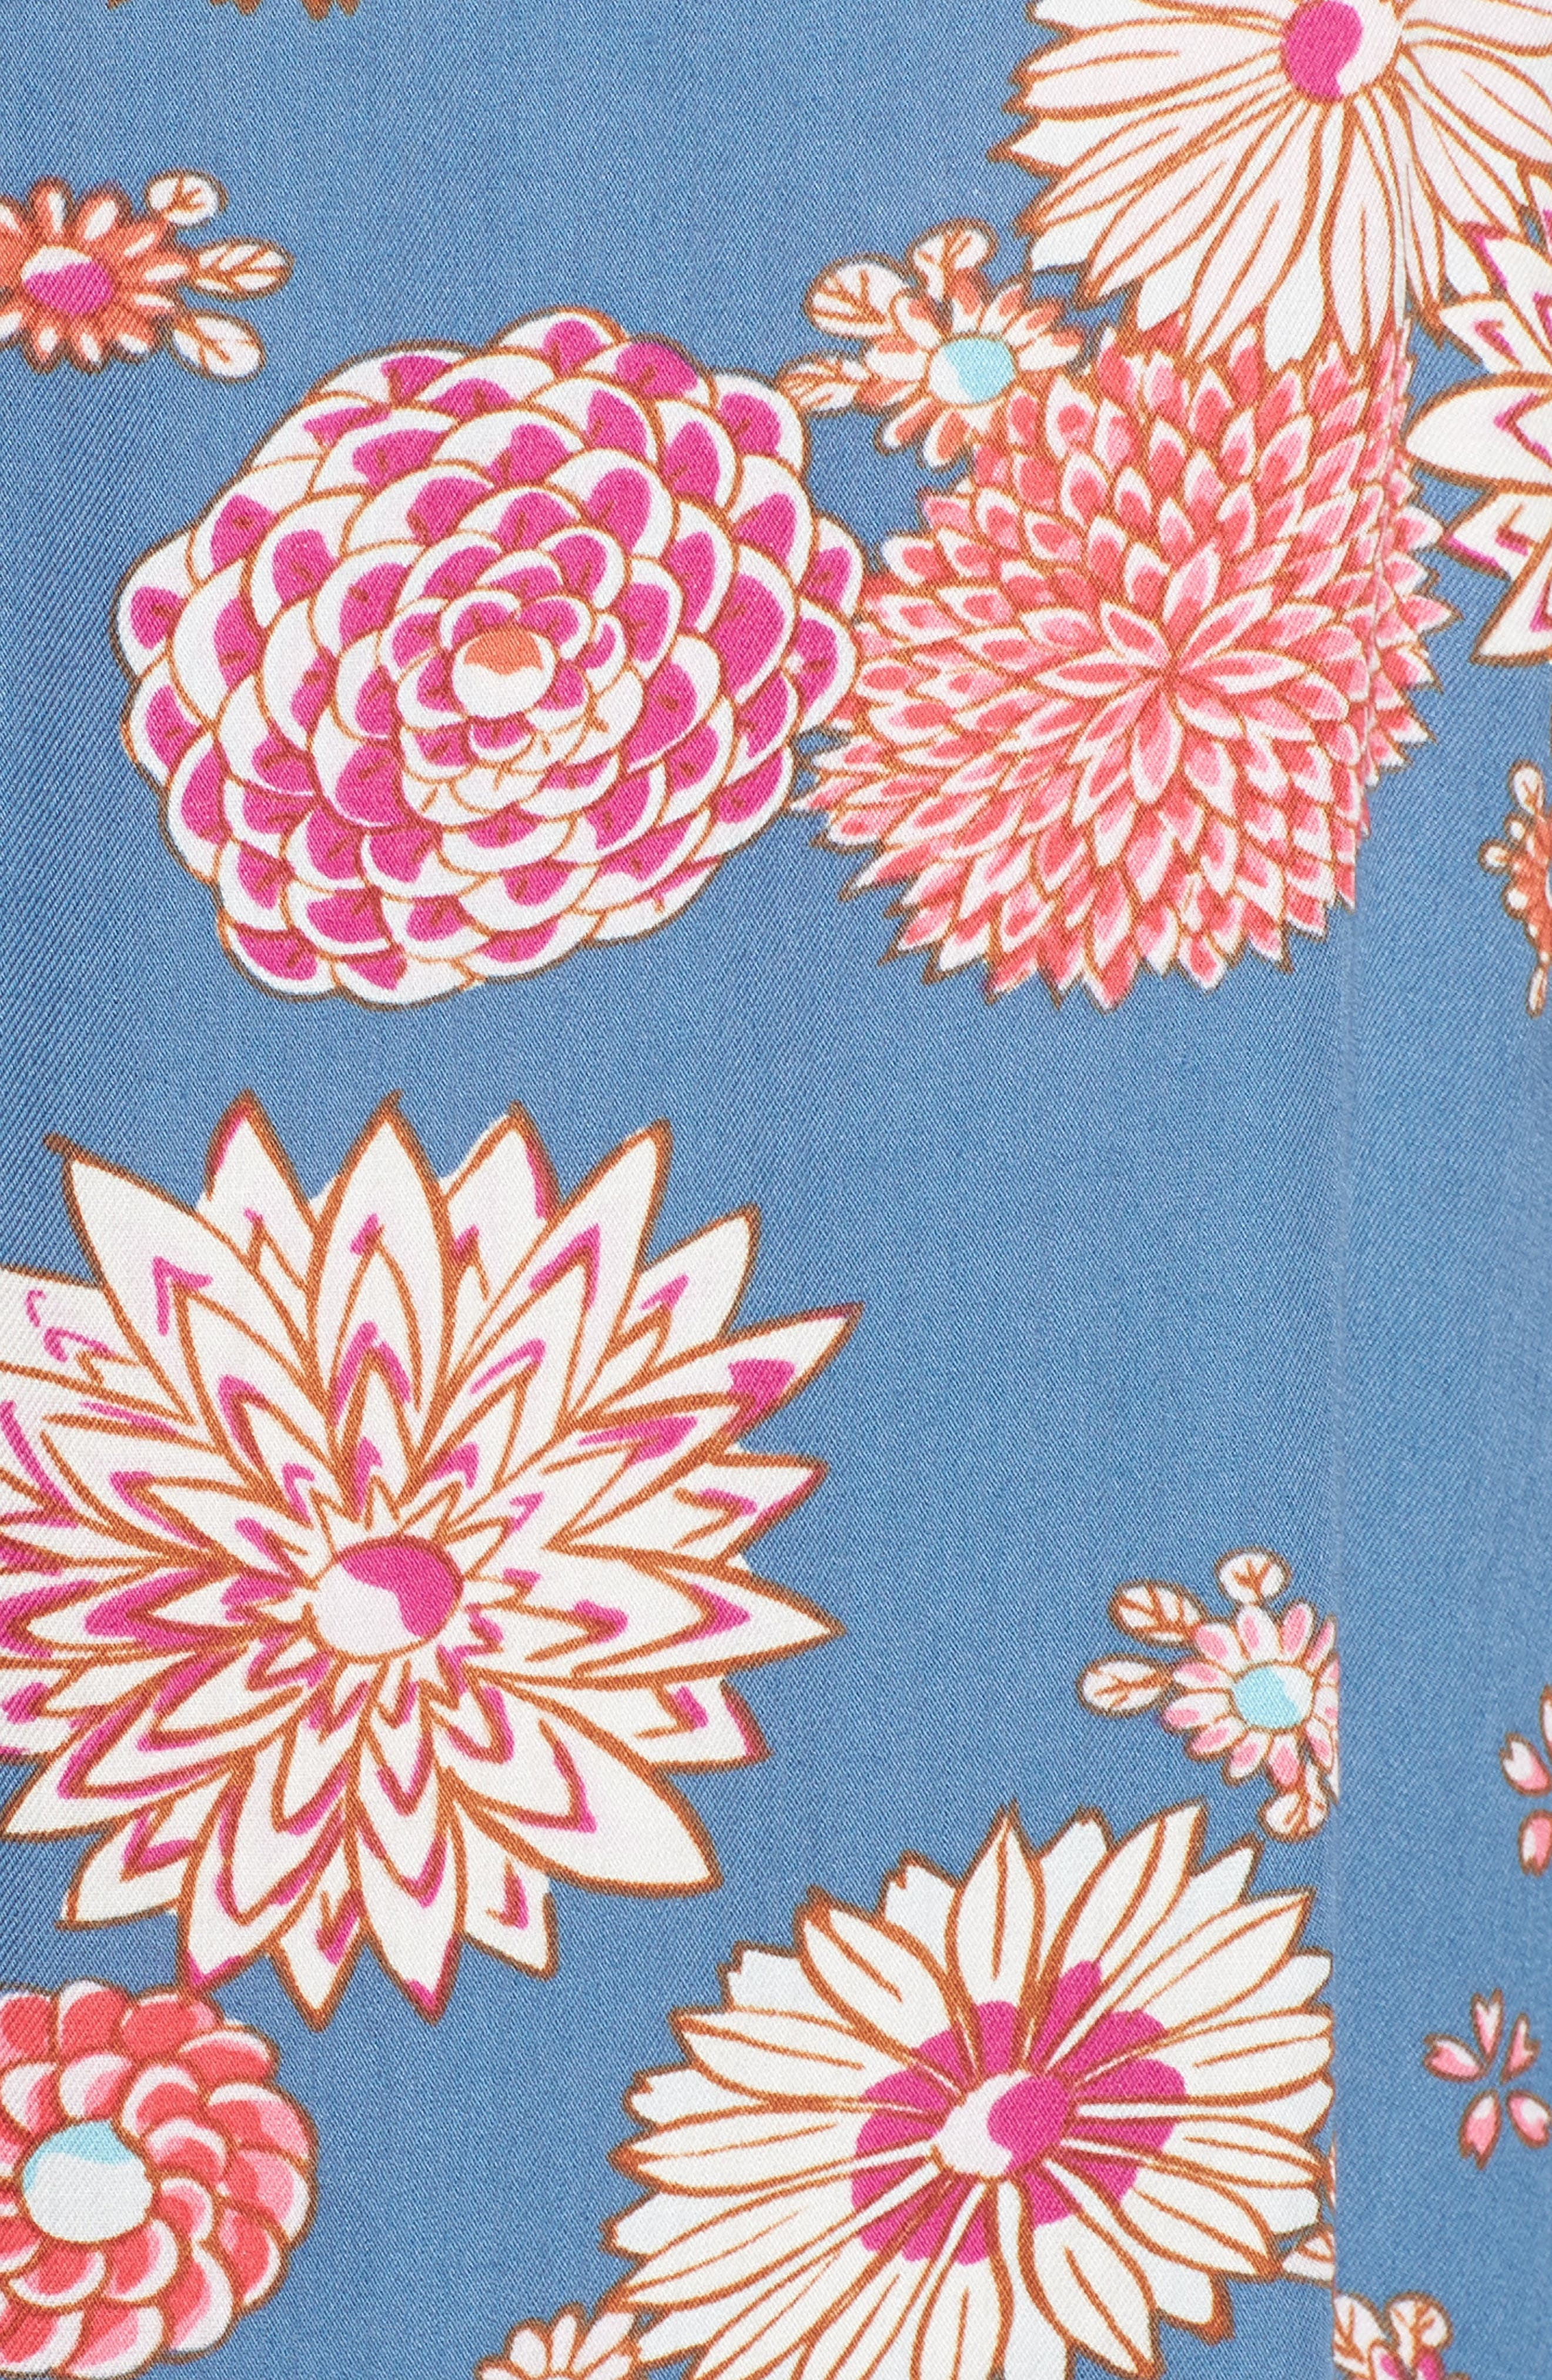 Floral Pajamas,                             Alternate thumbnail 5, color,                             Steallar Blue